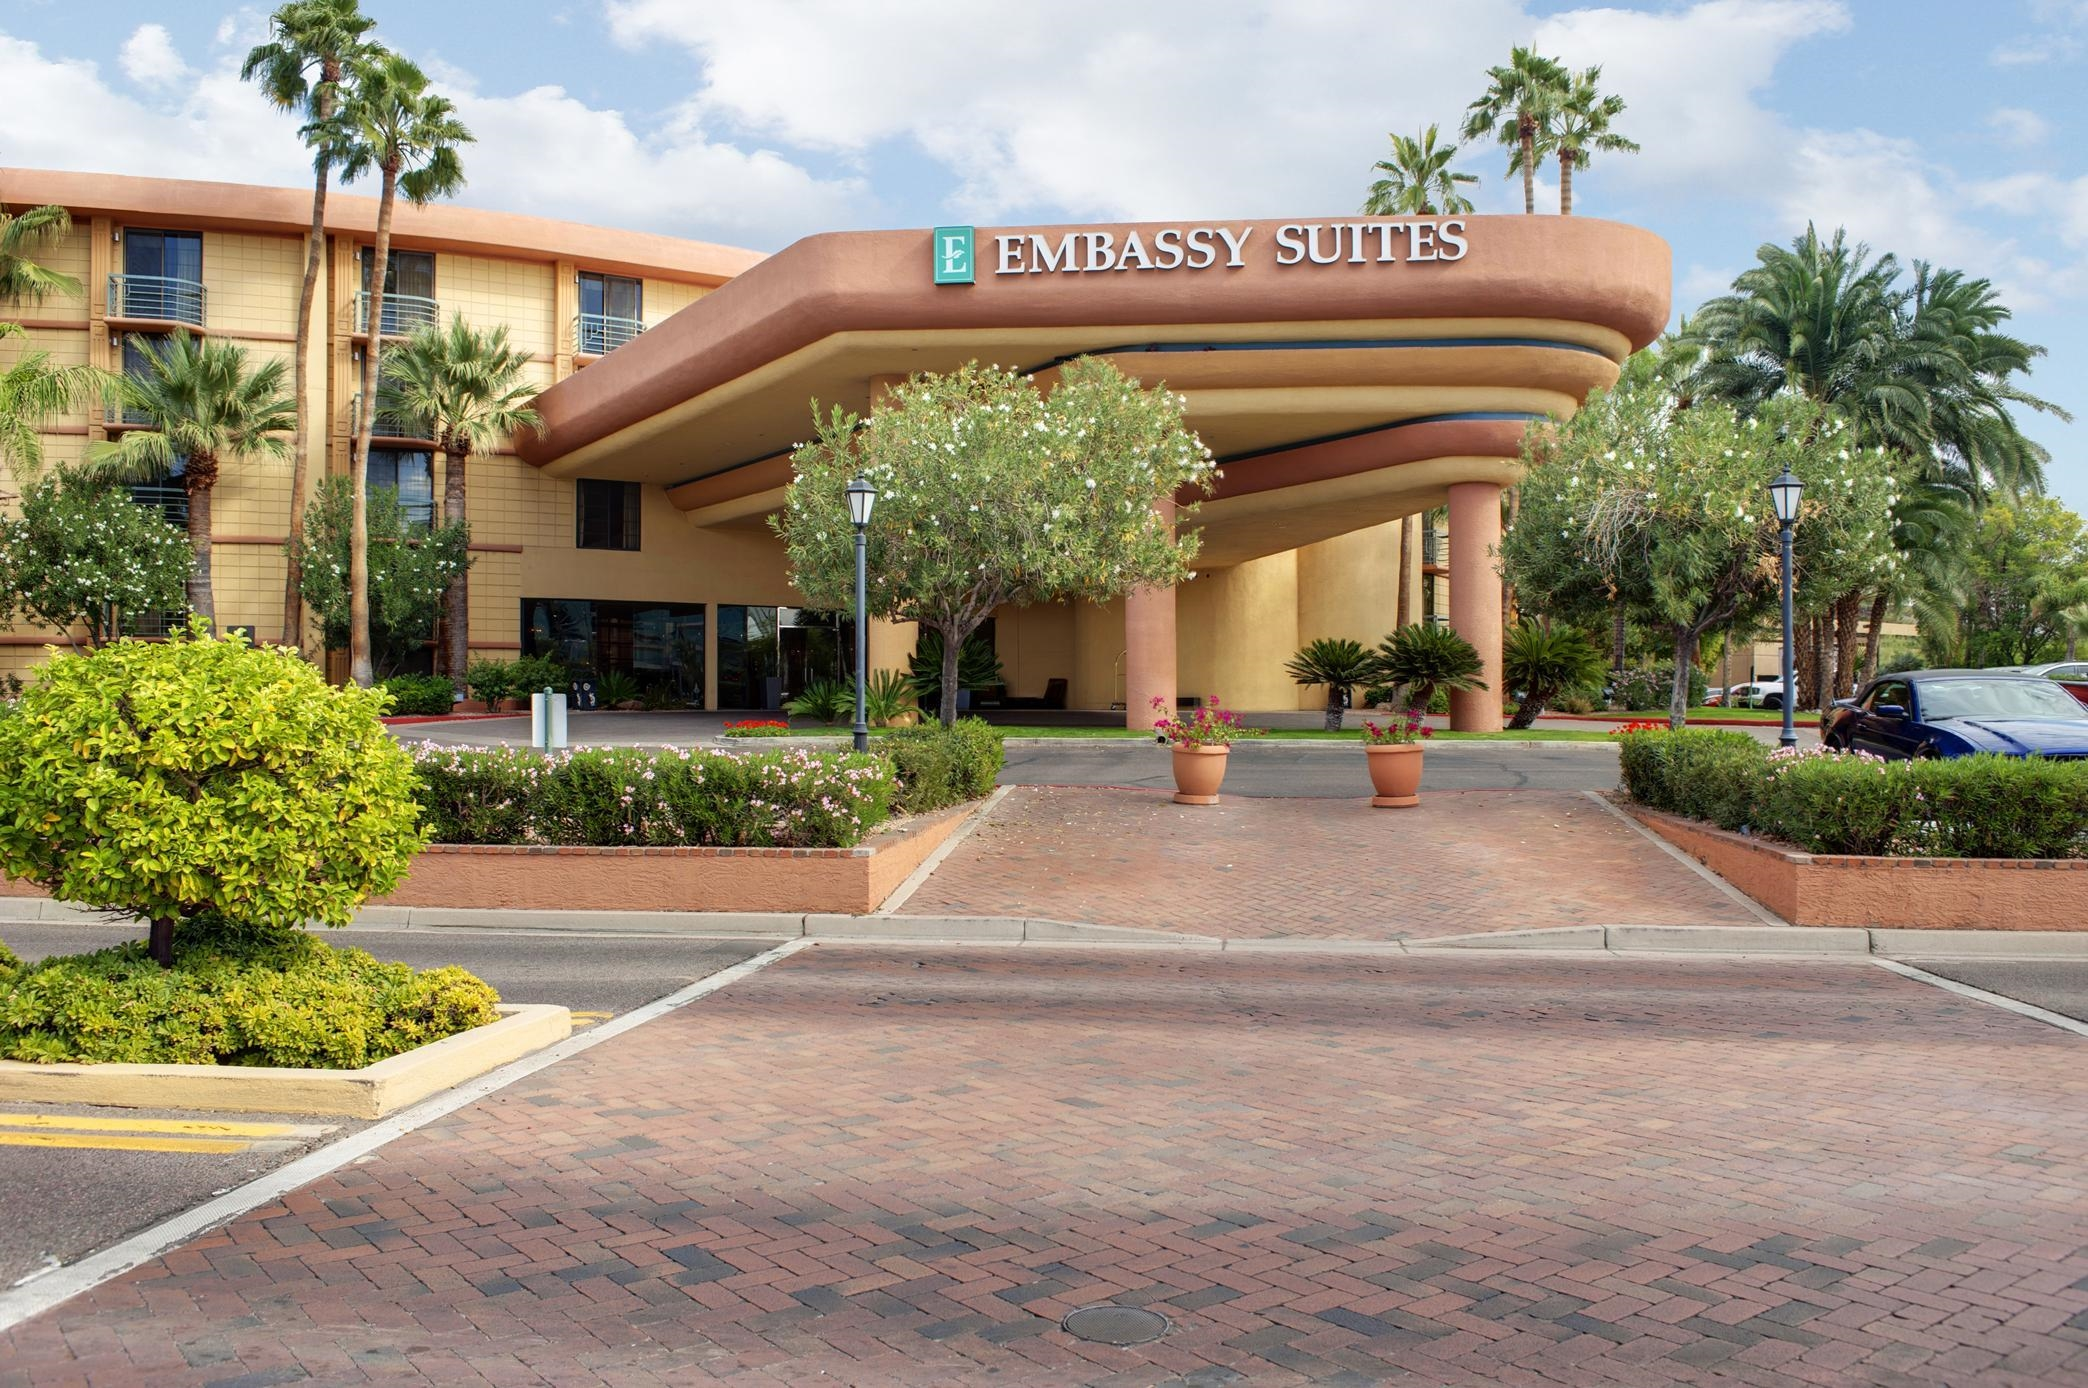 embassy suites by hilton phoenix biltmore 2630 east. Black Bedroom Furniture Sets. Home Design Ideas